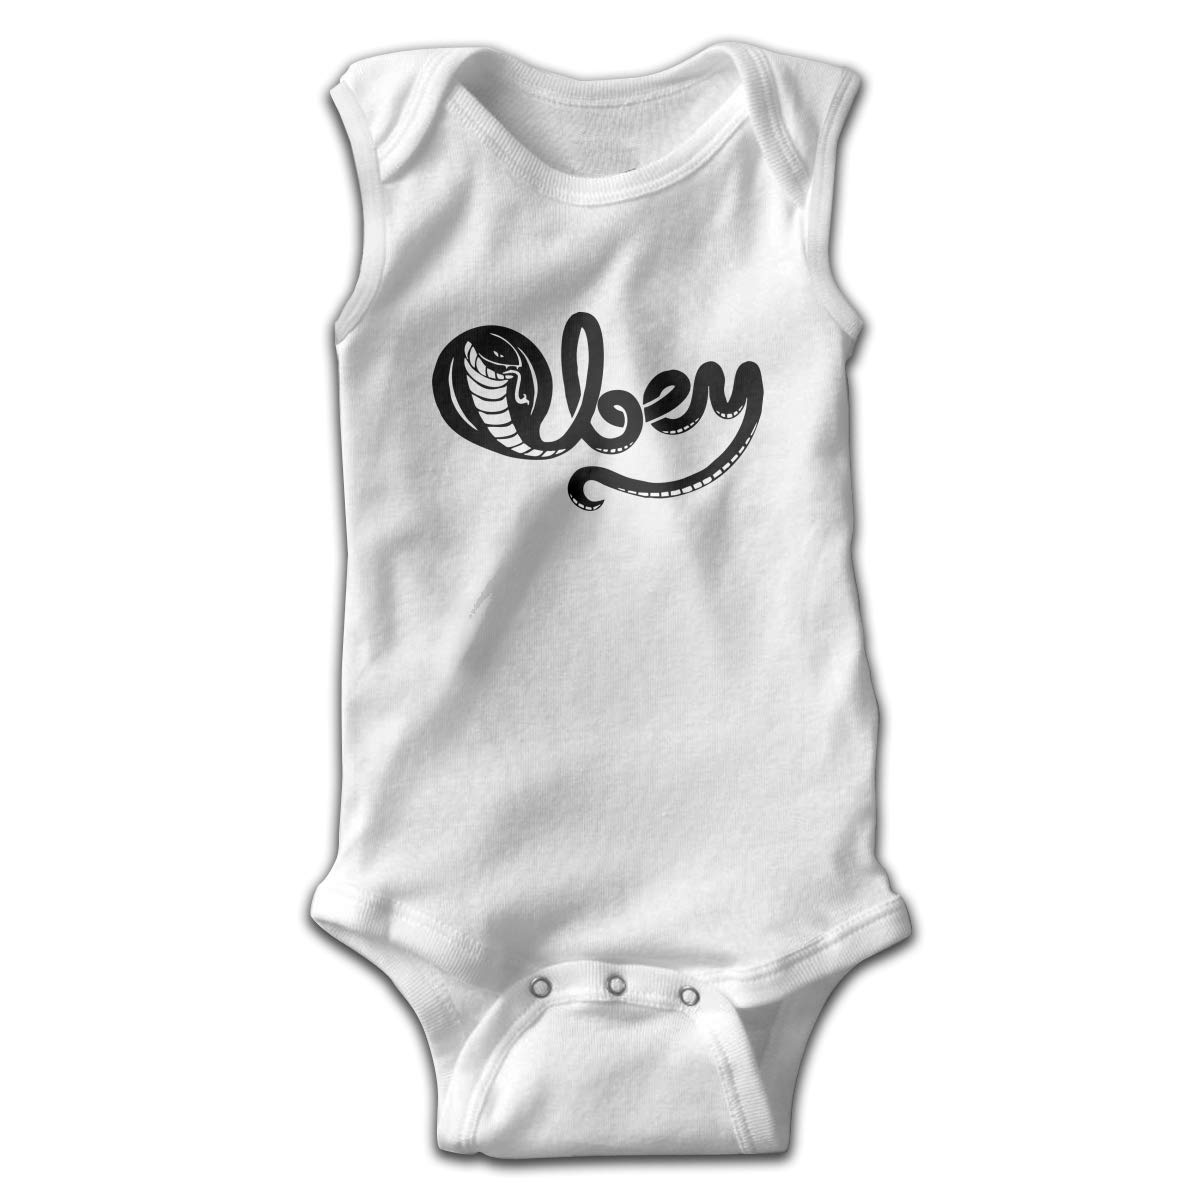 Efbj Toddler Baby Boys Rompers Sleeveless Cotton Onesie,Snake Black Logo Bodysuit Autumn Pajamas